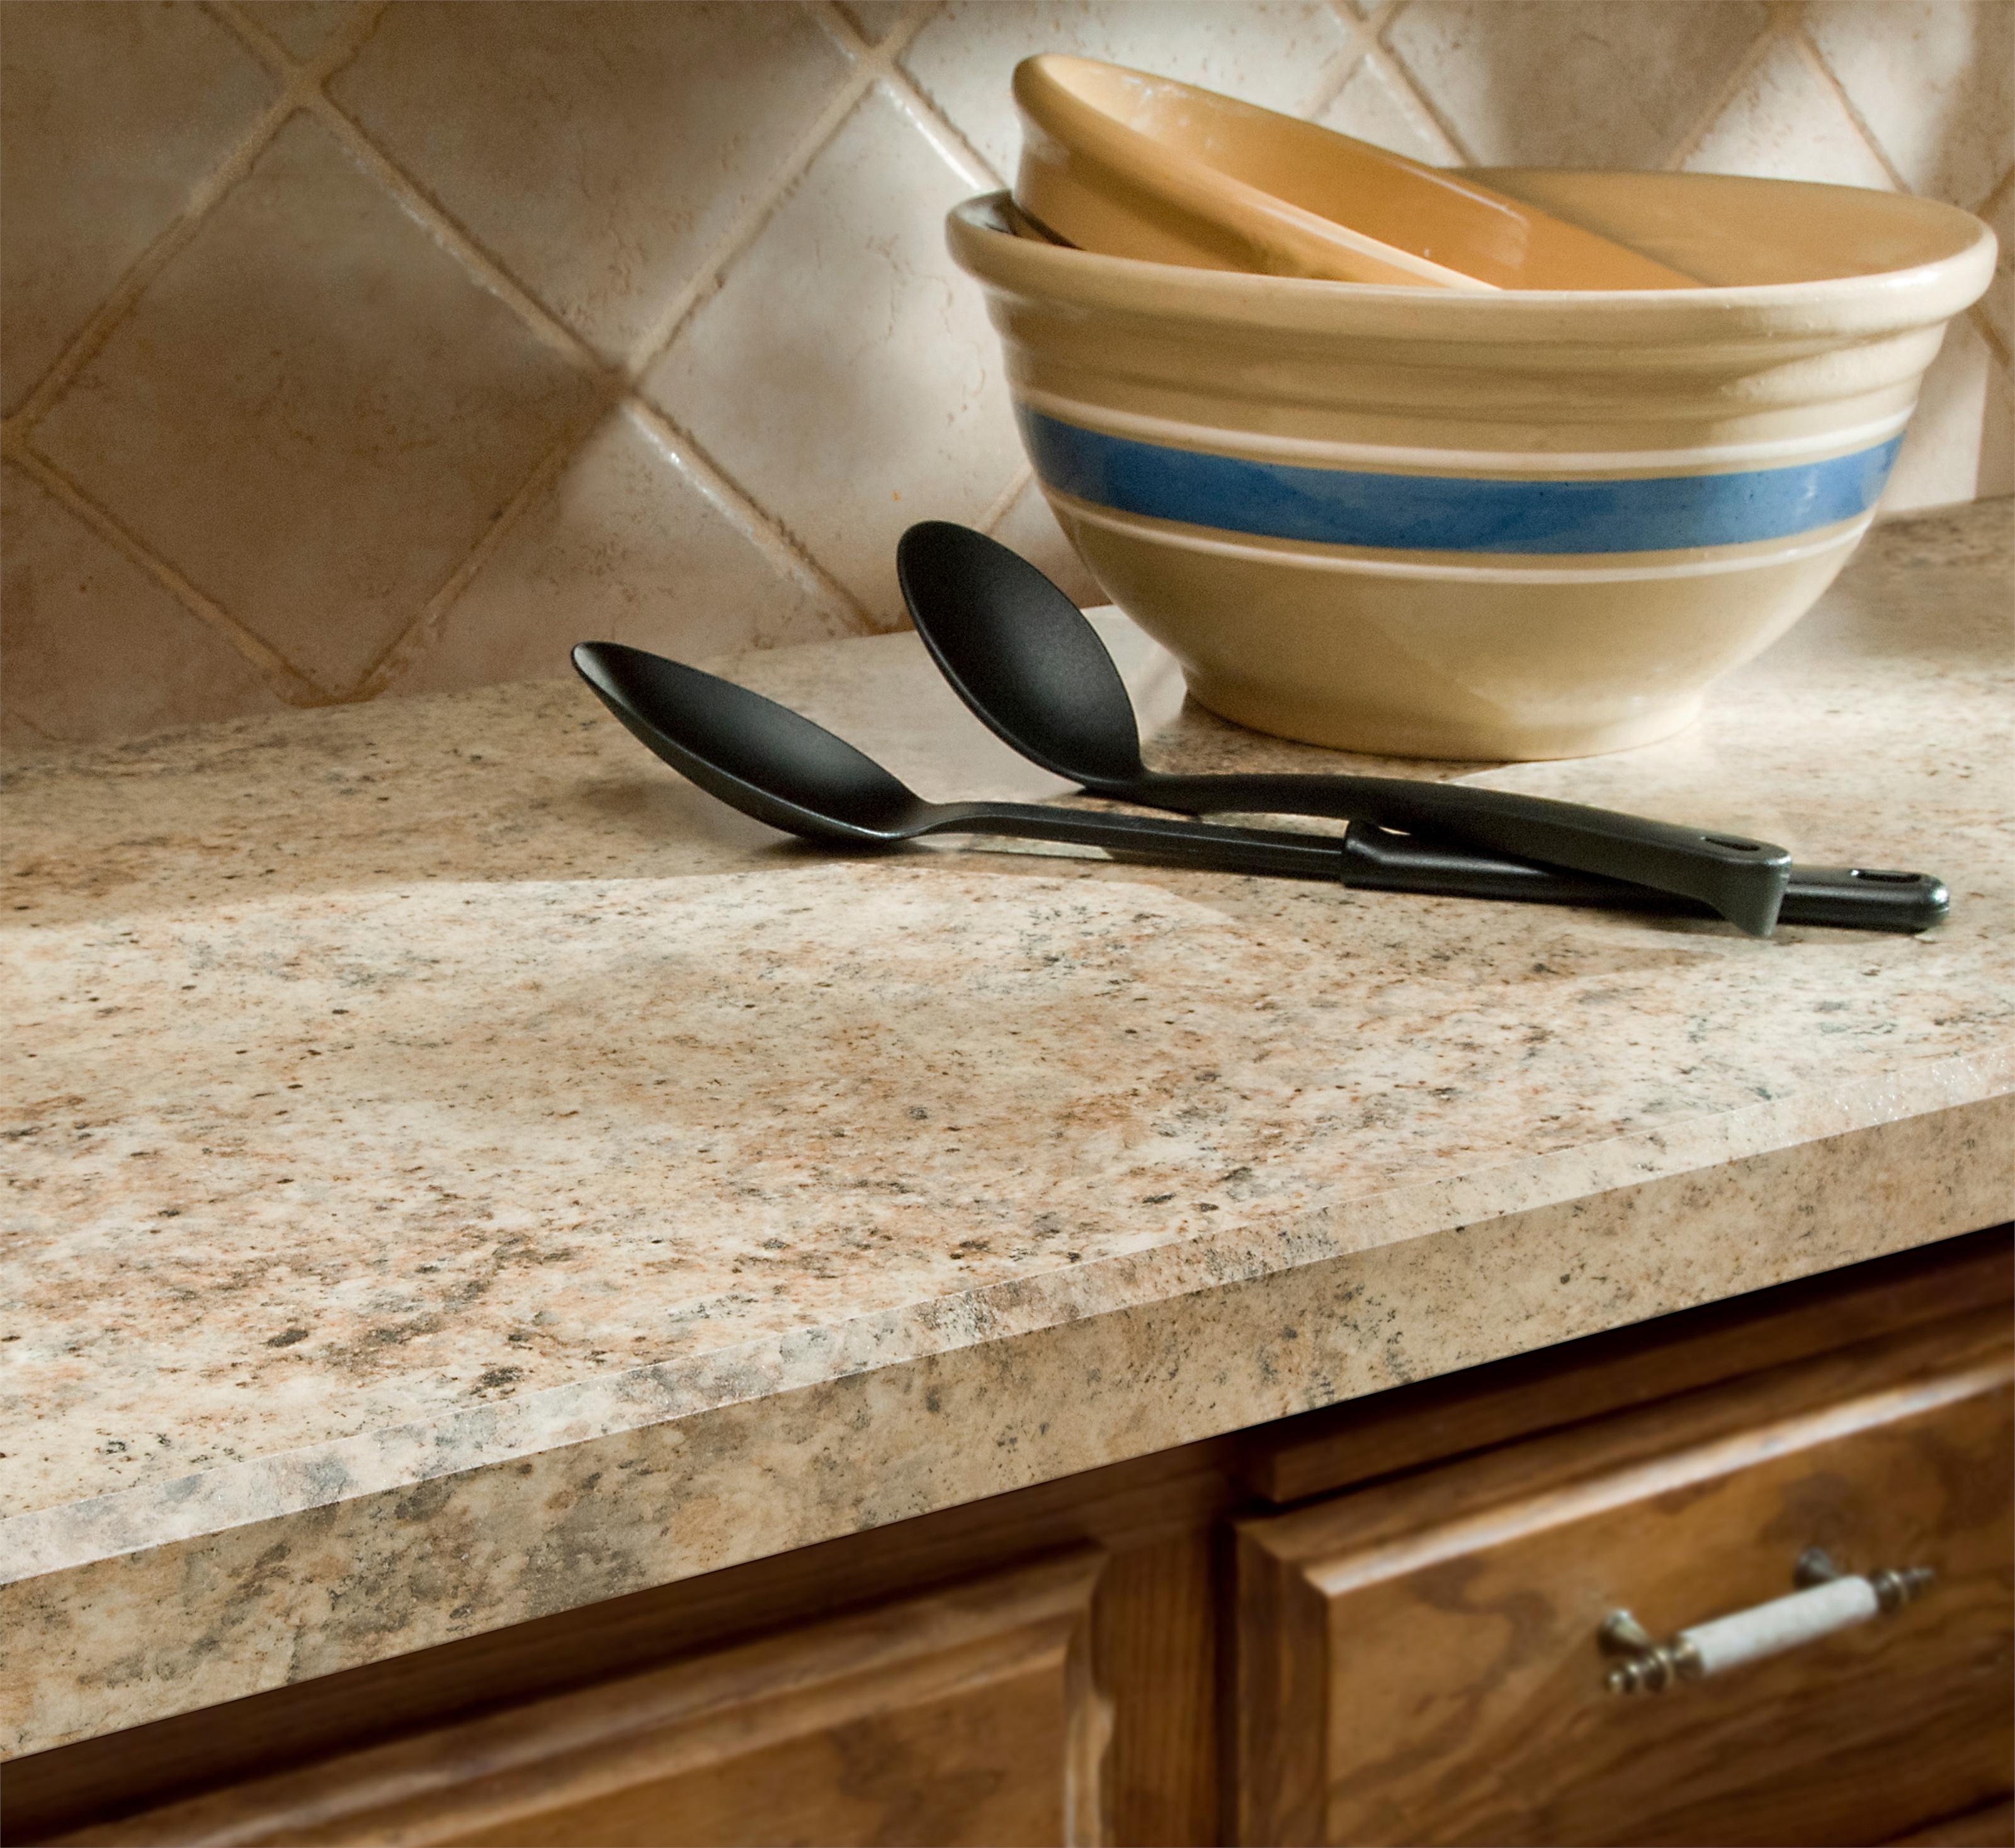 pictures of laminate kitchen countertops furniture sets madura citrine wilsonart pinterest popup